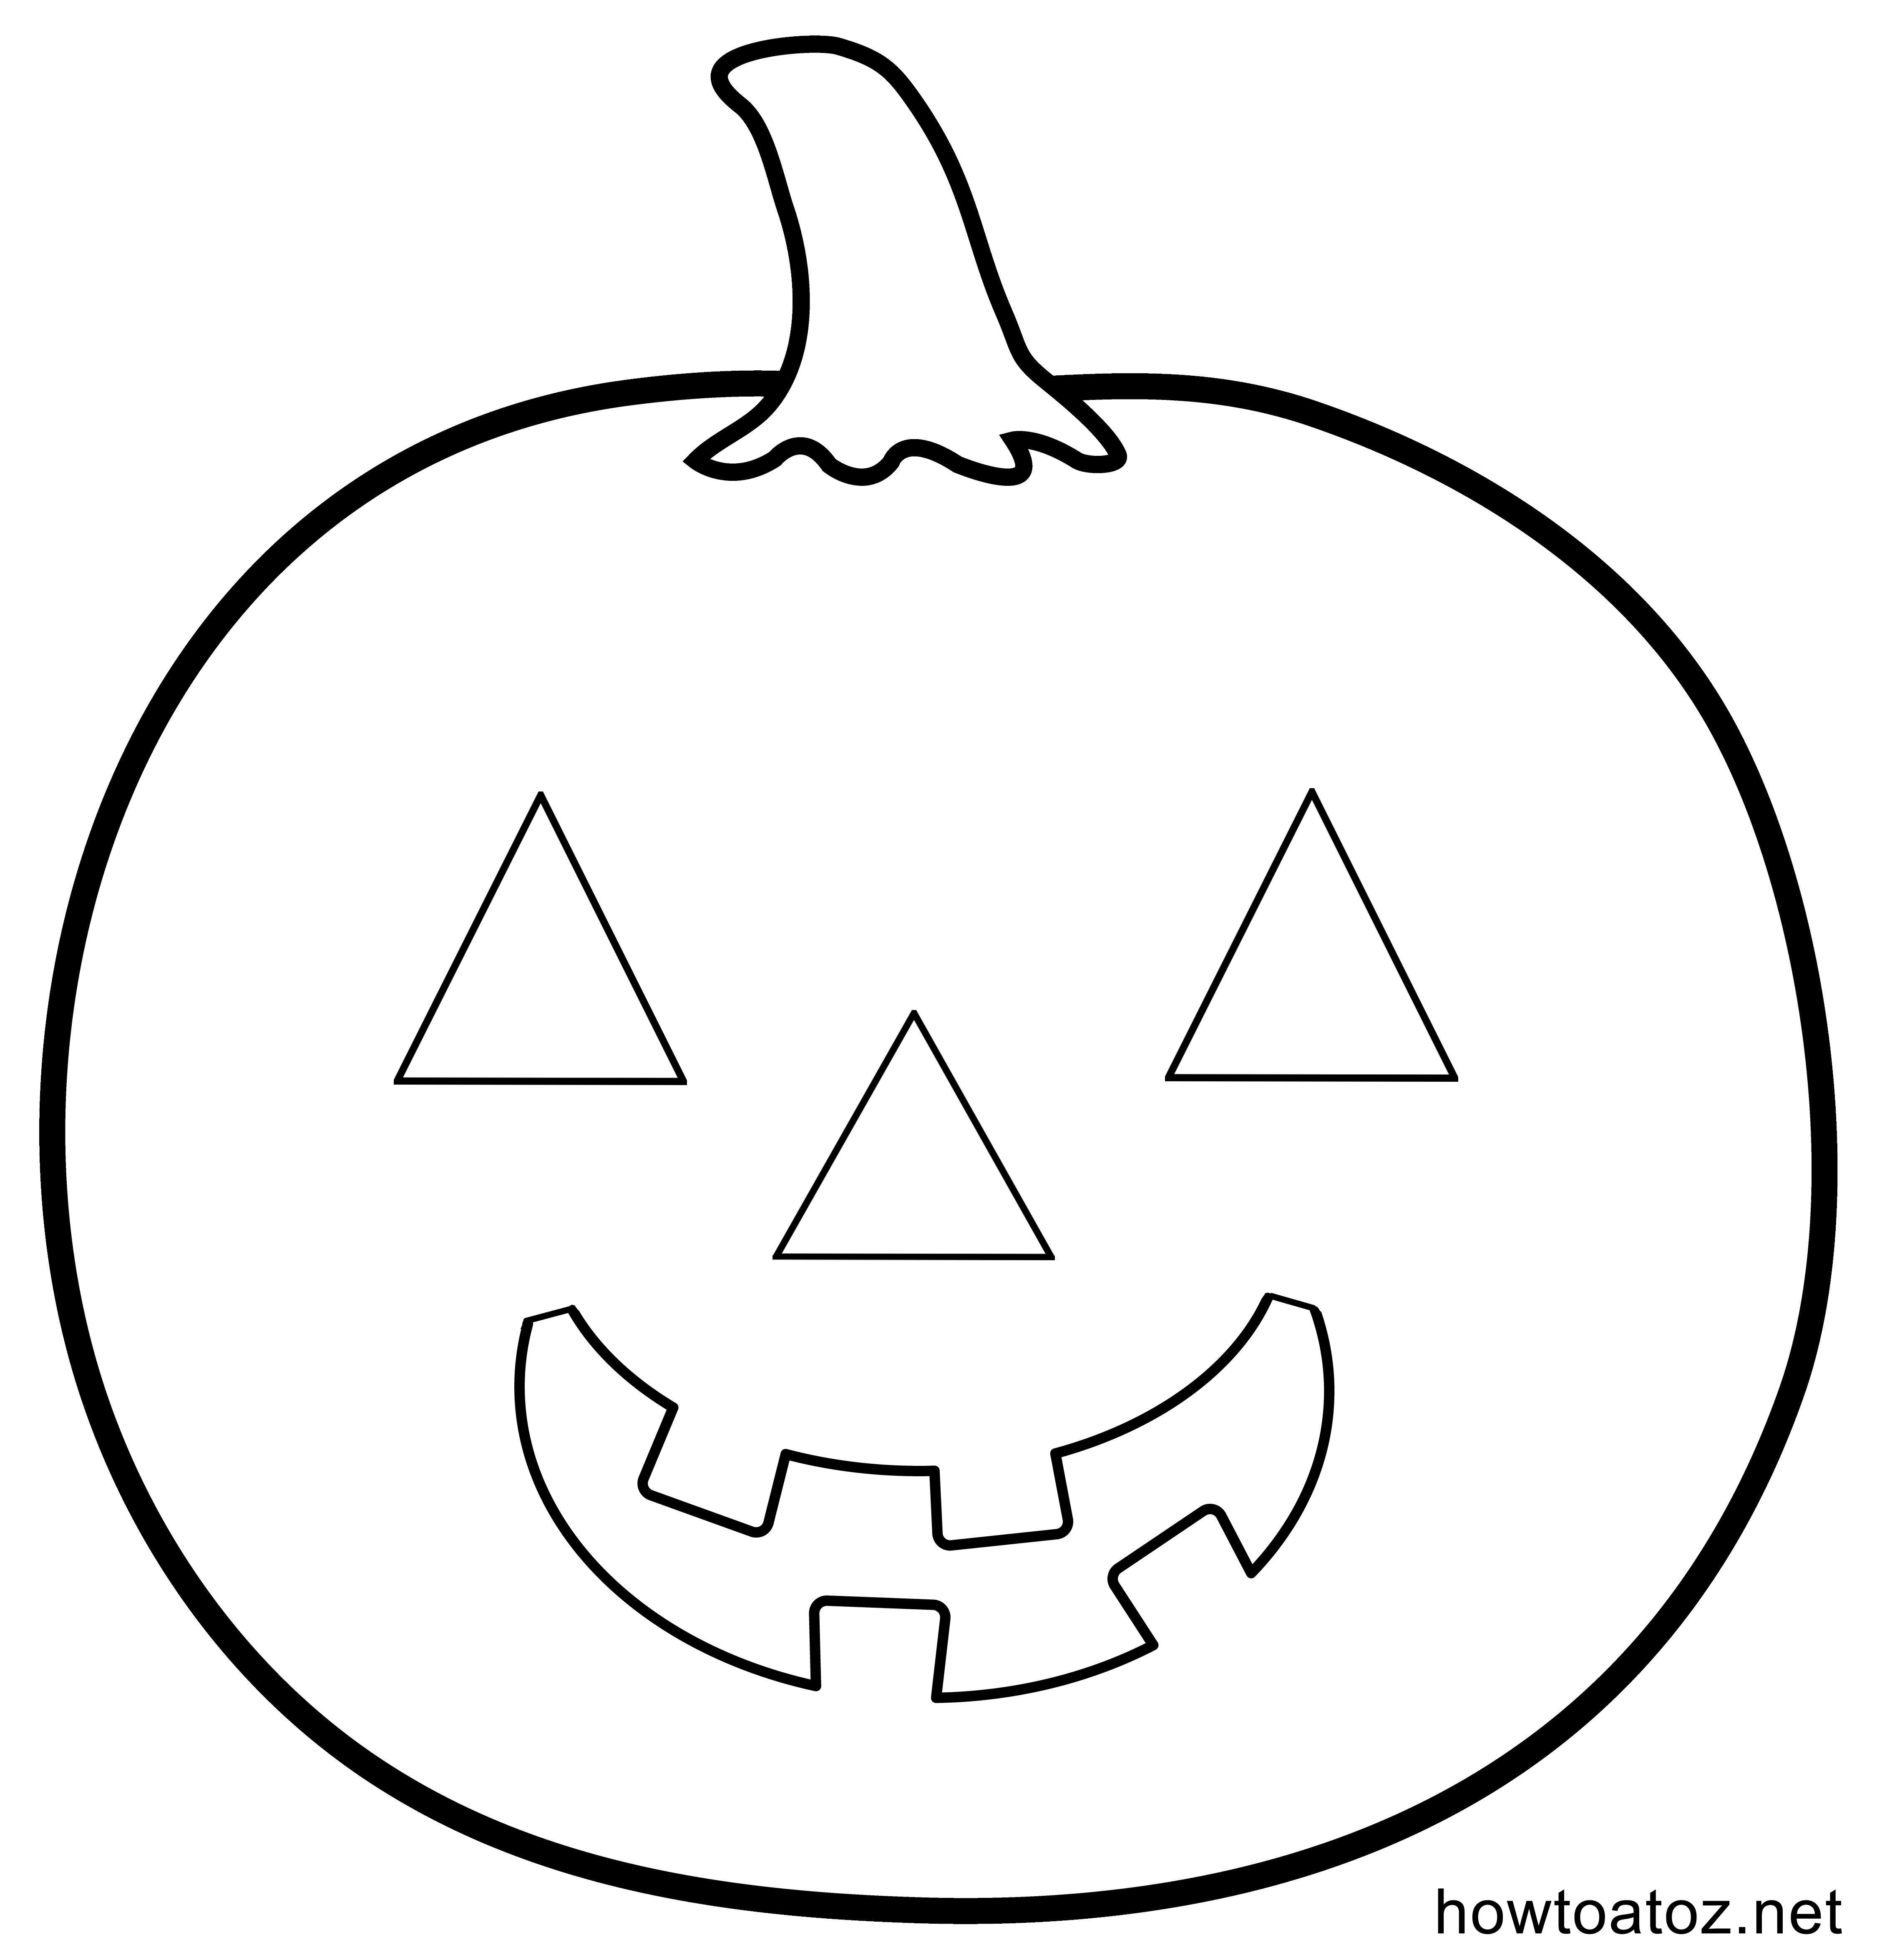 Free Halloween Decoration Stencils And Templates #halloween - Jack O Lantern Templates Printable Free